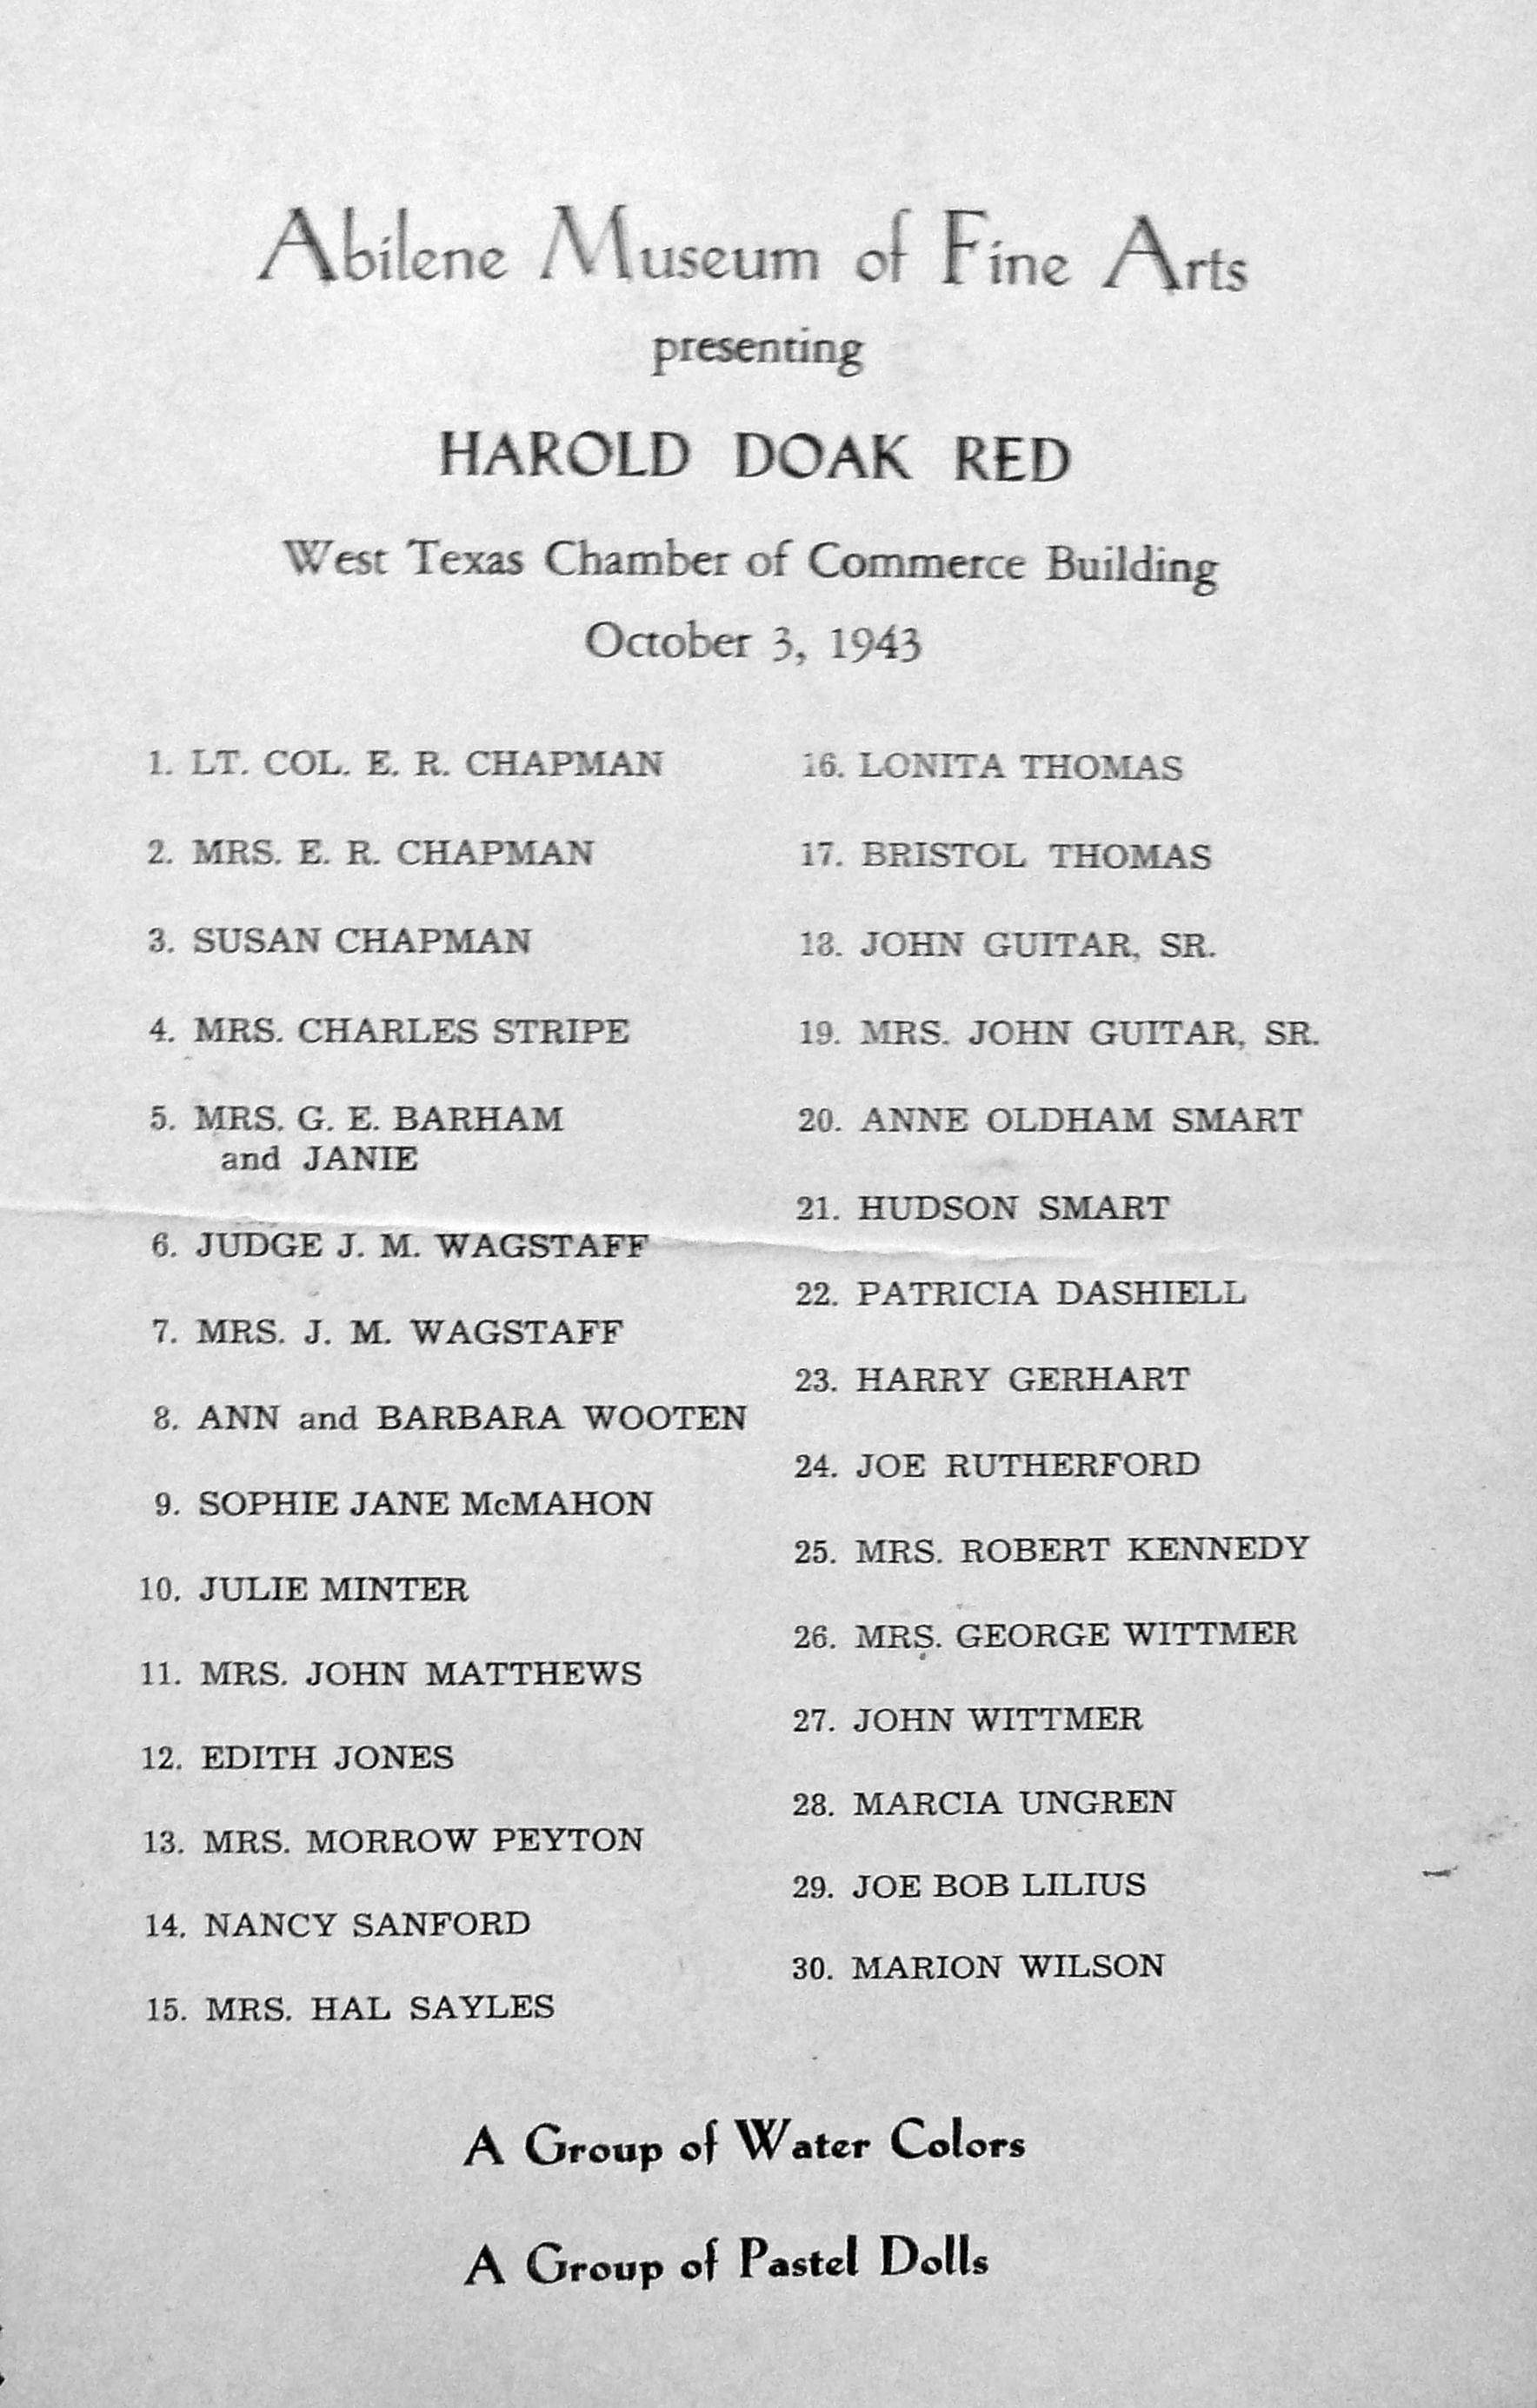 AFAM Harold Doak Red 1943.jpg